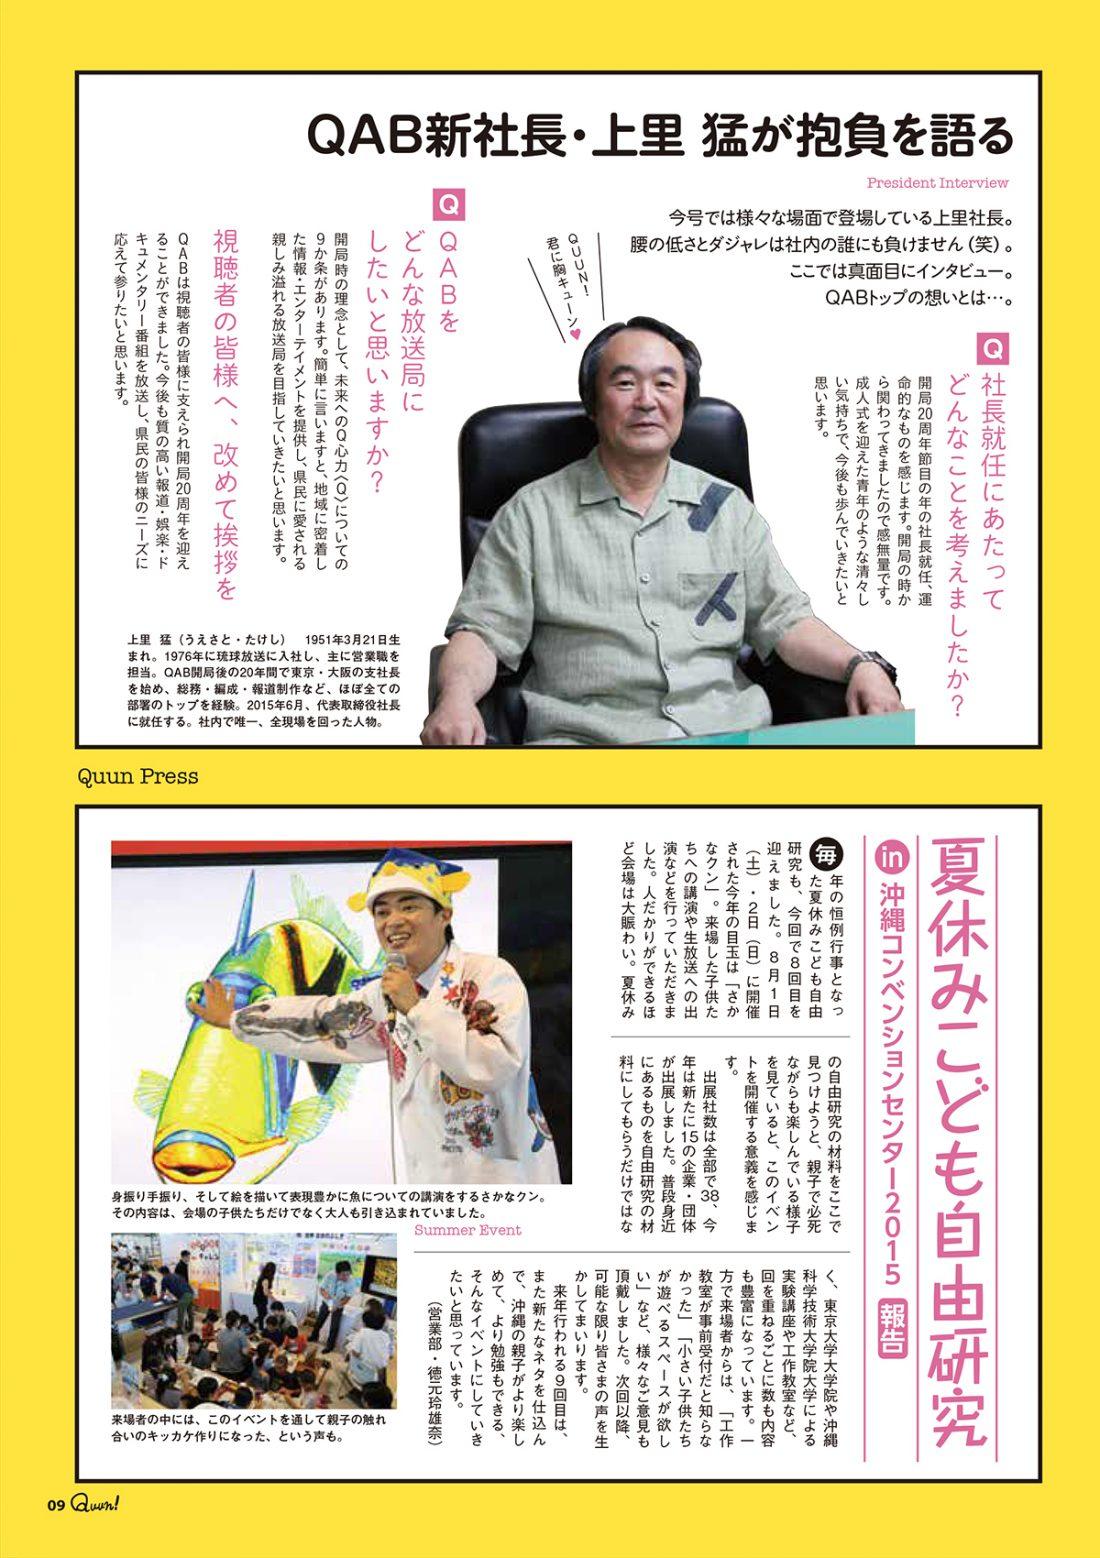 http://www.qab.co.jp/qgoro/wp-content/uploads/quun_0411-1100x1558.jpg